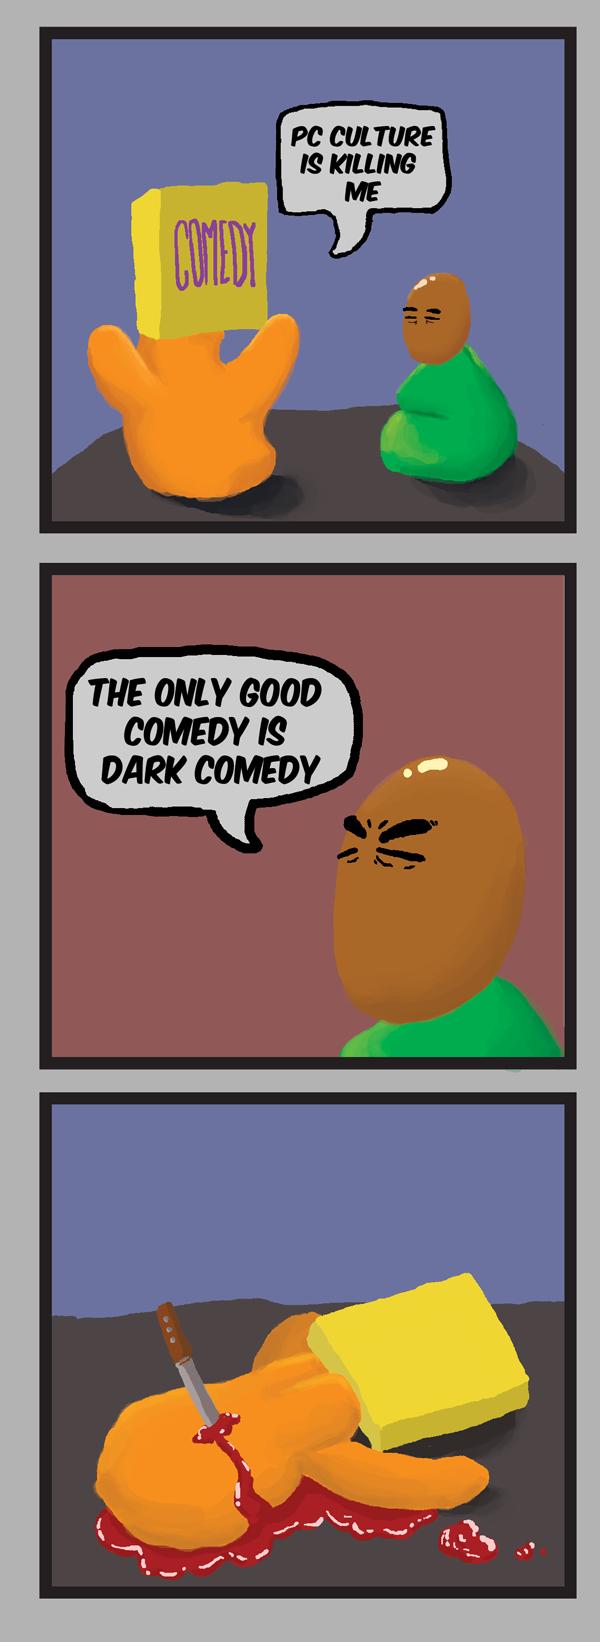 DeathOfComedy